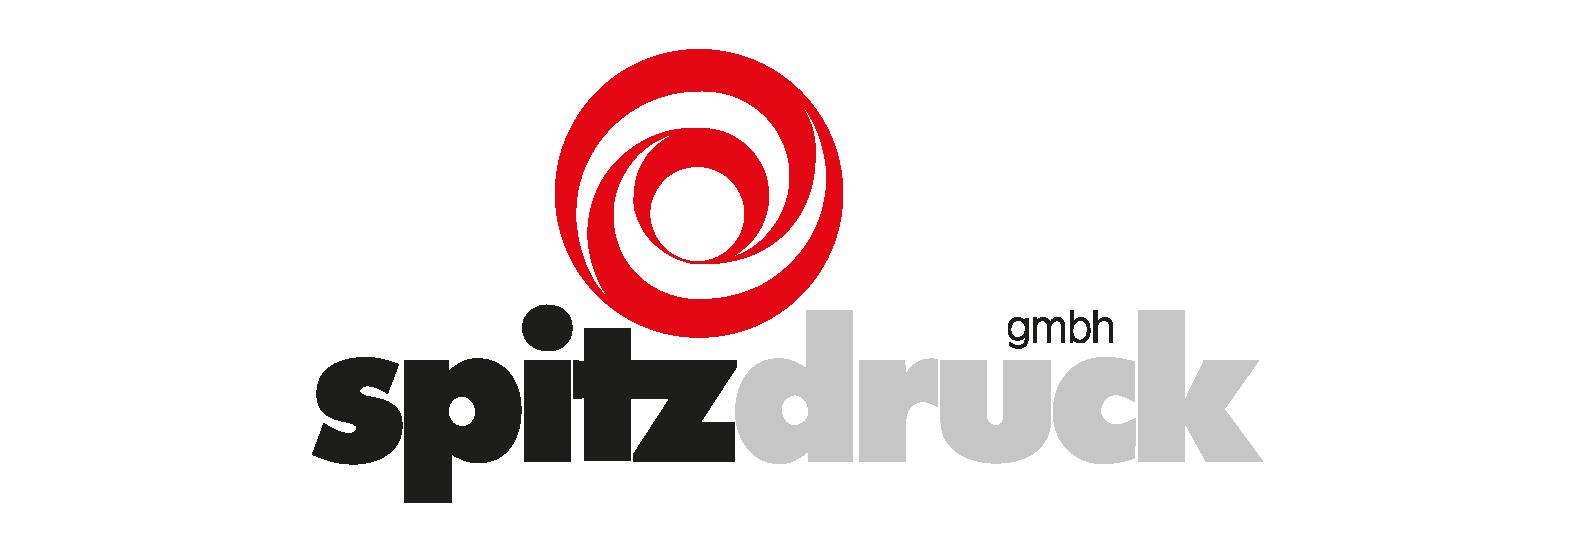 https://www.betreuung-und-pflege.de/app/files/2021/02/Spitzdruck-gmbh.png